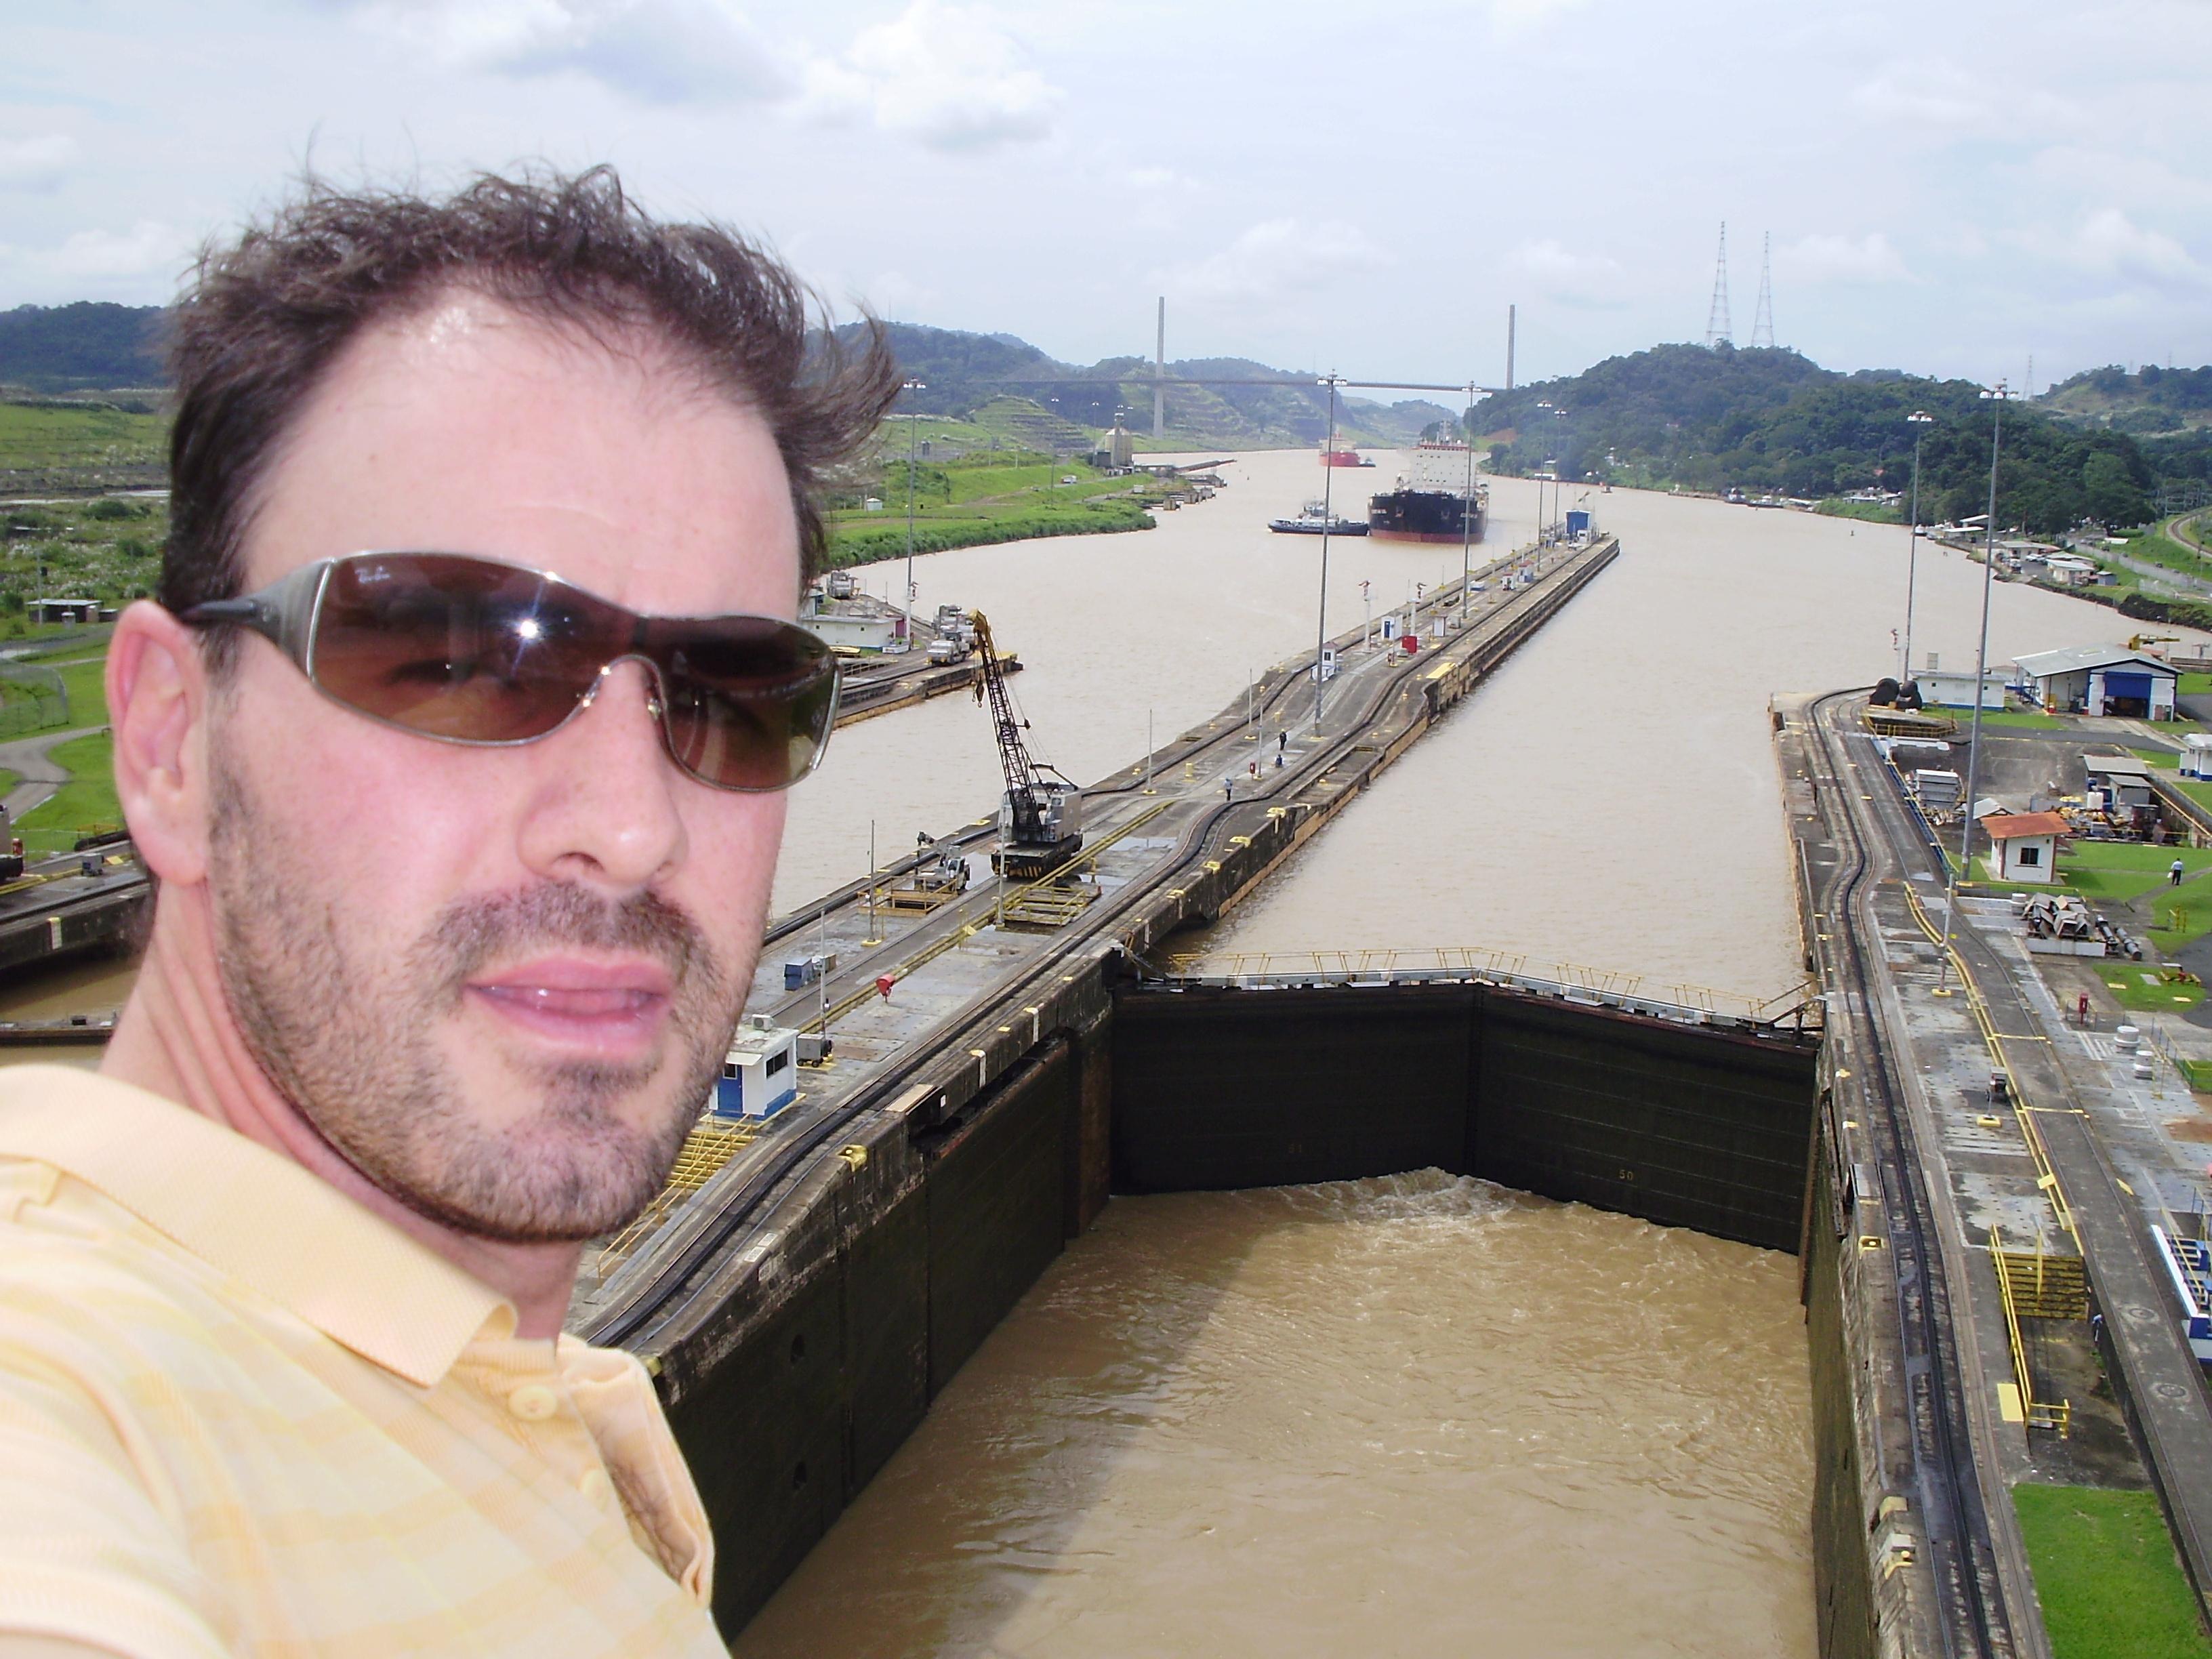 Canal de Panamé, mejores cruceros para 2016